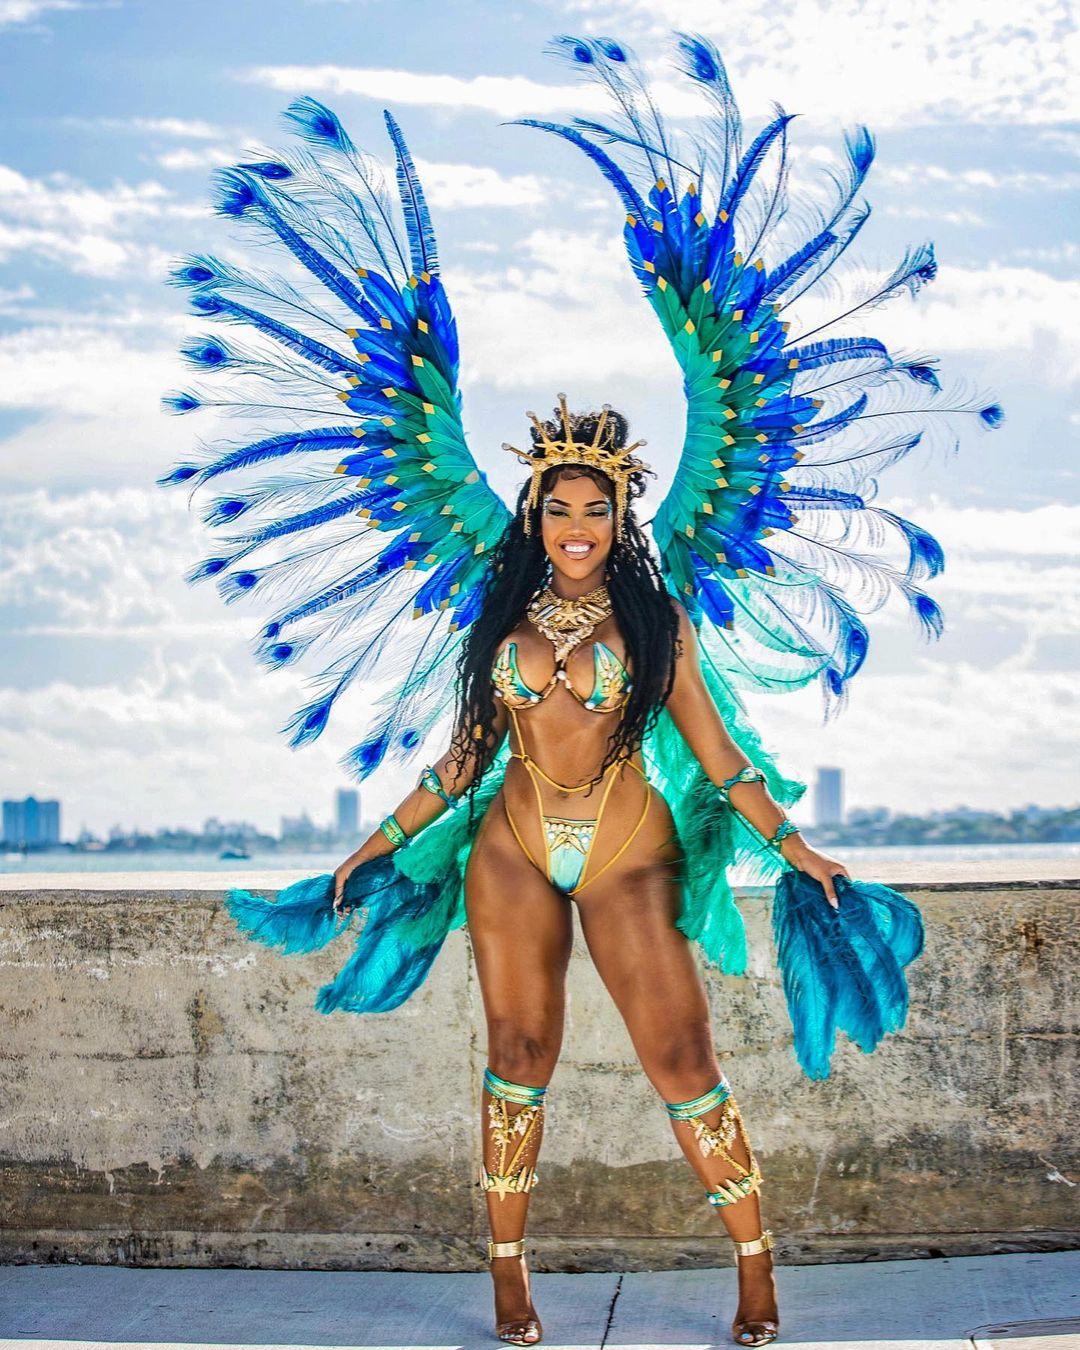 jessleewong-miami-carnival.jpg